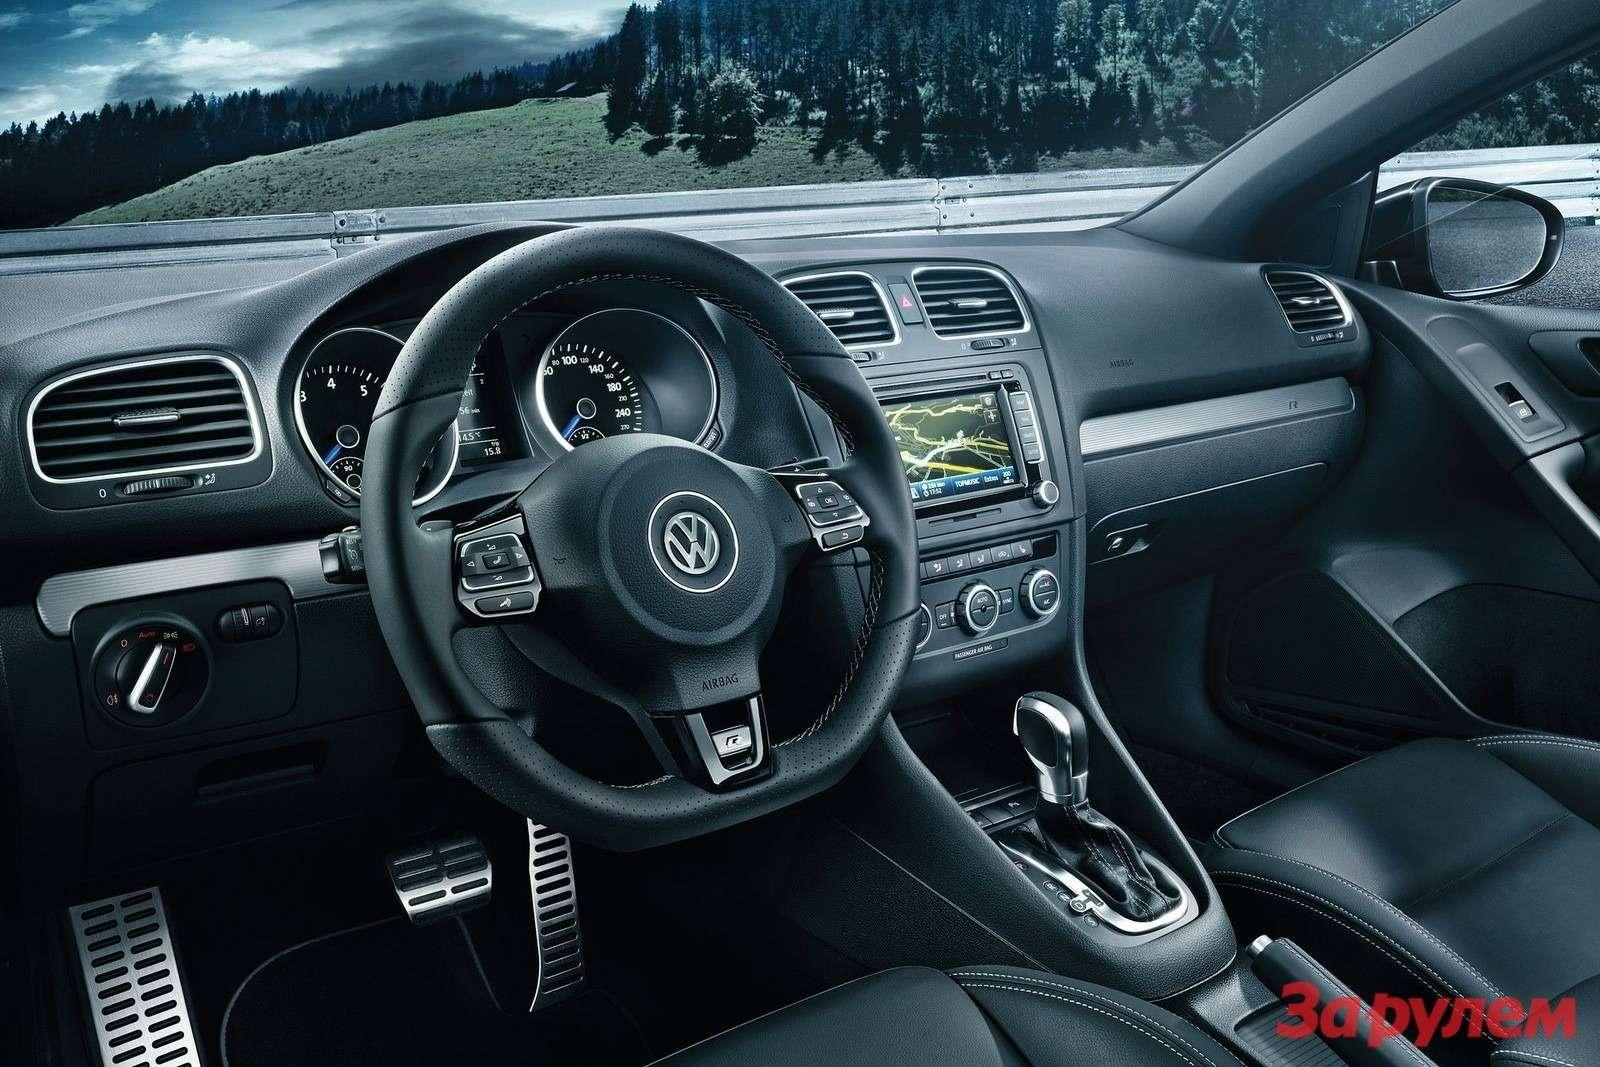 Volkswagen-Golf_R_Cabriolet_2014_1600x1200_wallpaper_0d